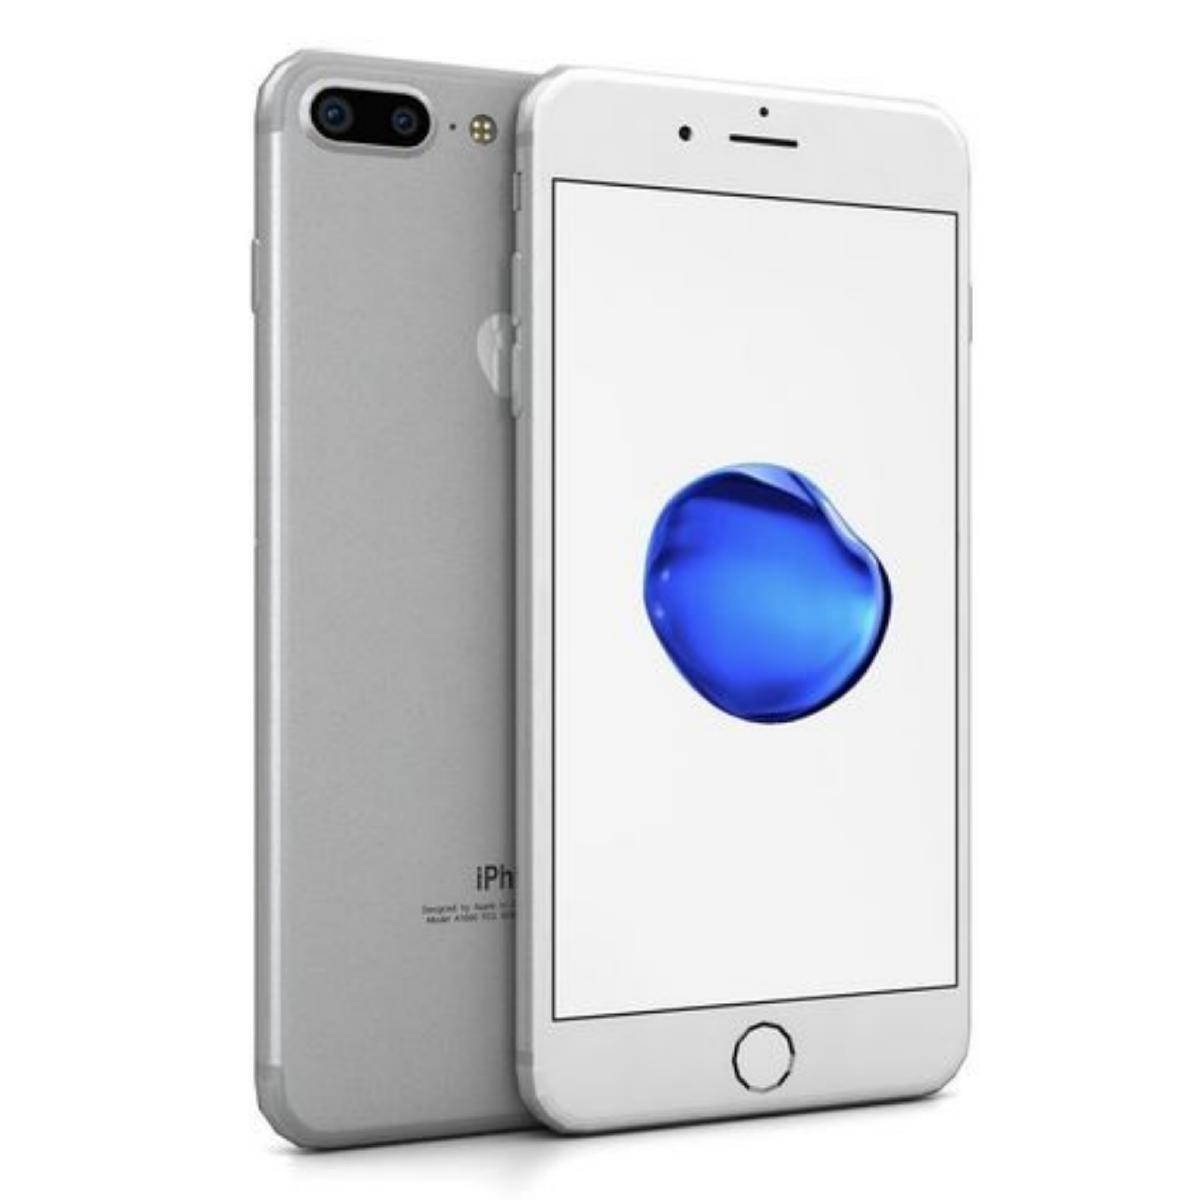 Apple iPhone 7 Plus (Verizon), 32GB, Silver, A1661  (Used)